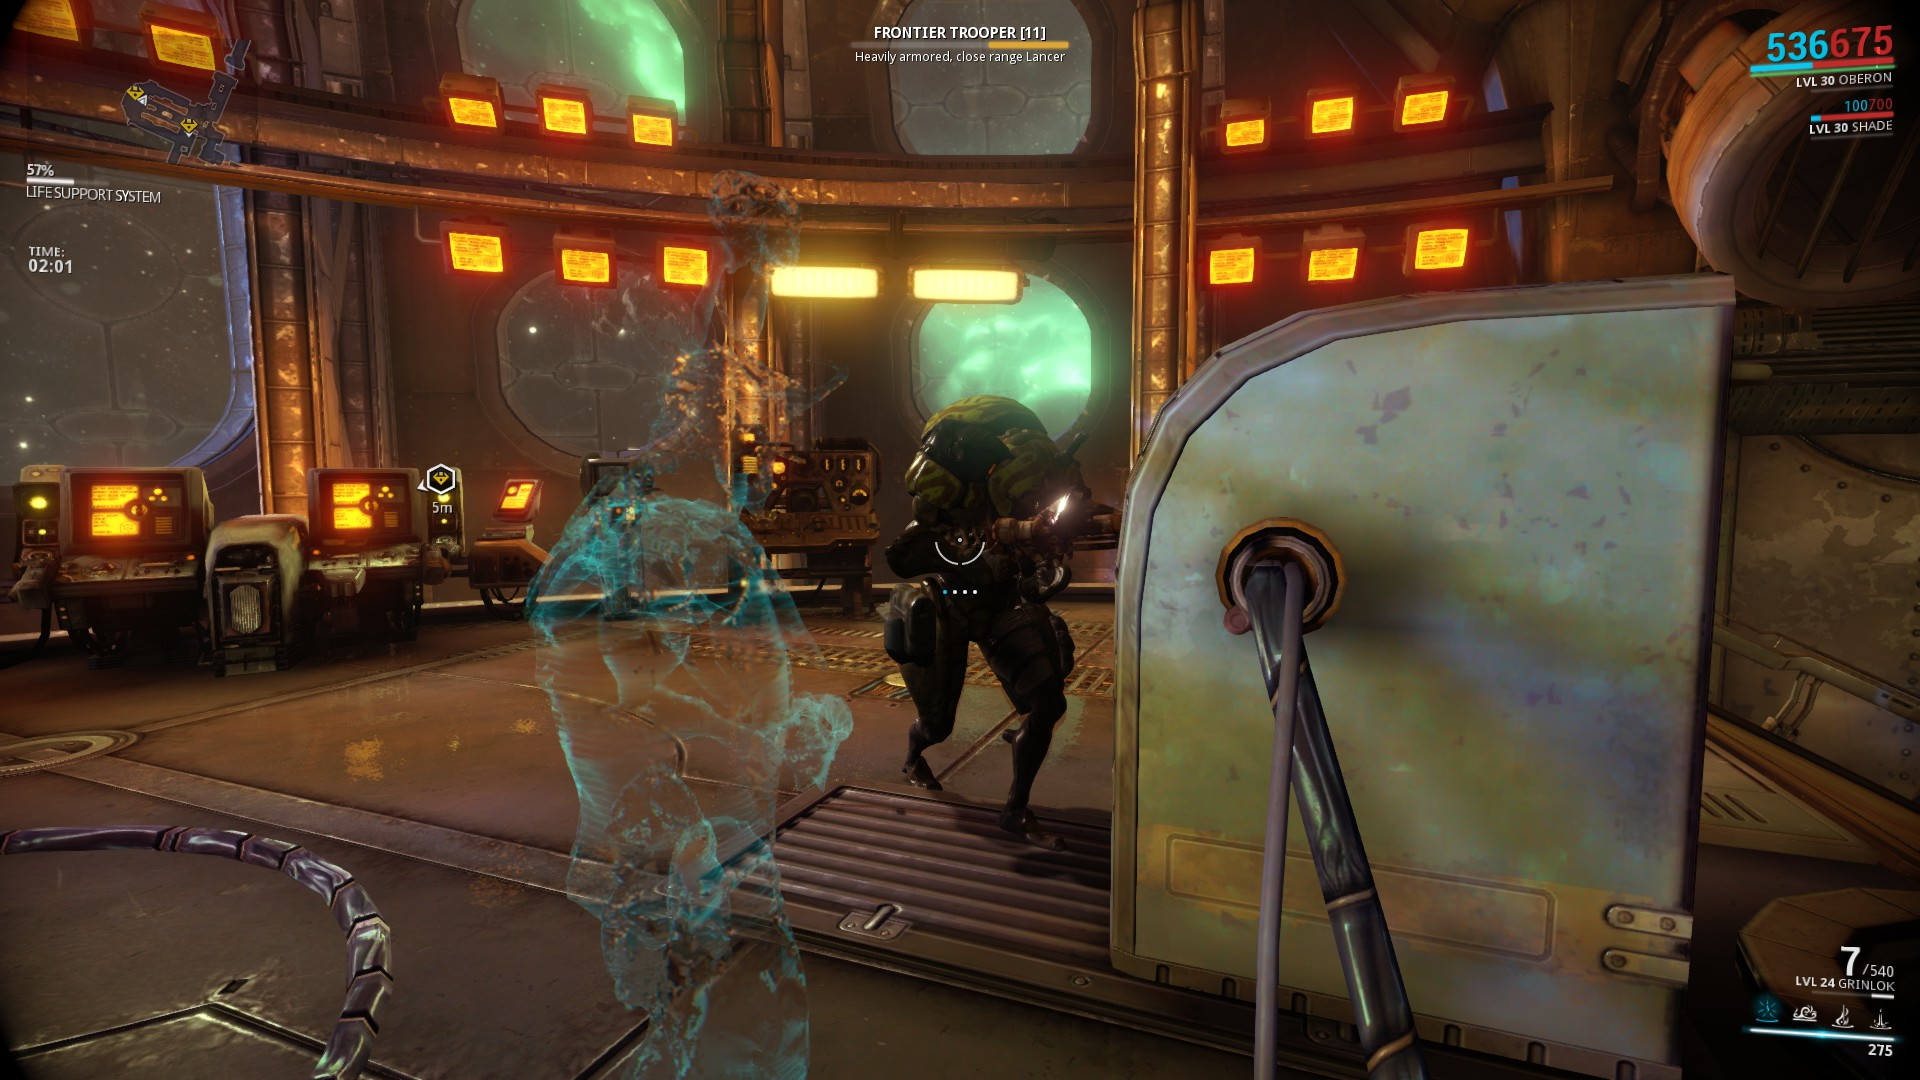 steam community screenshot frontier